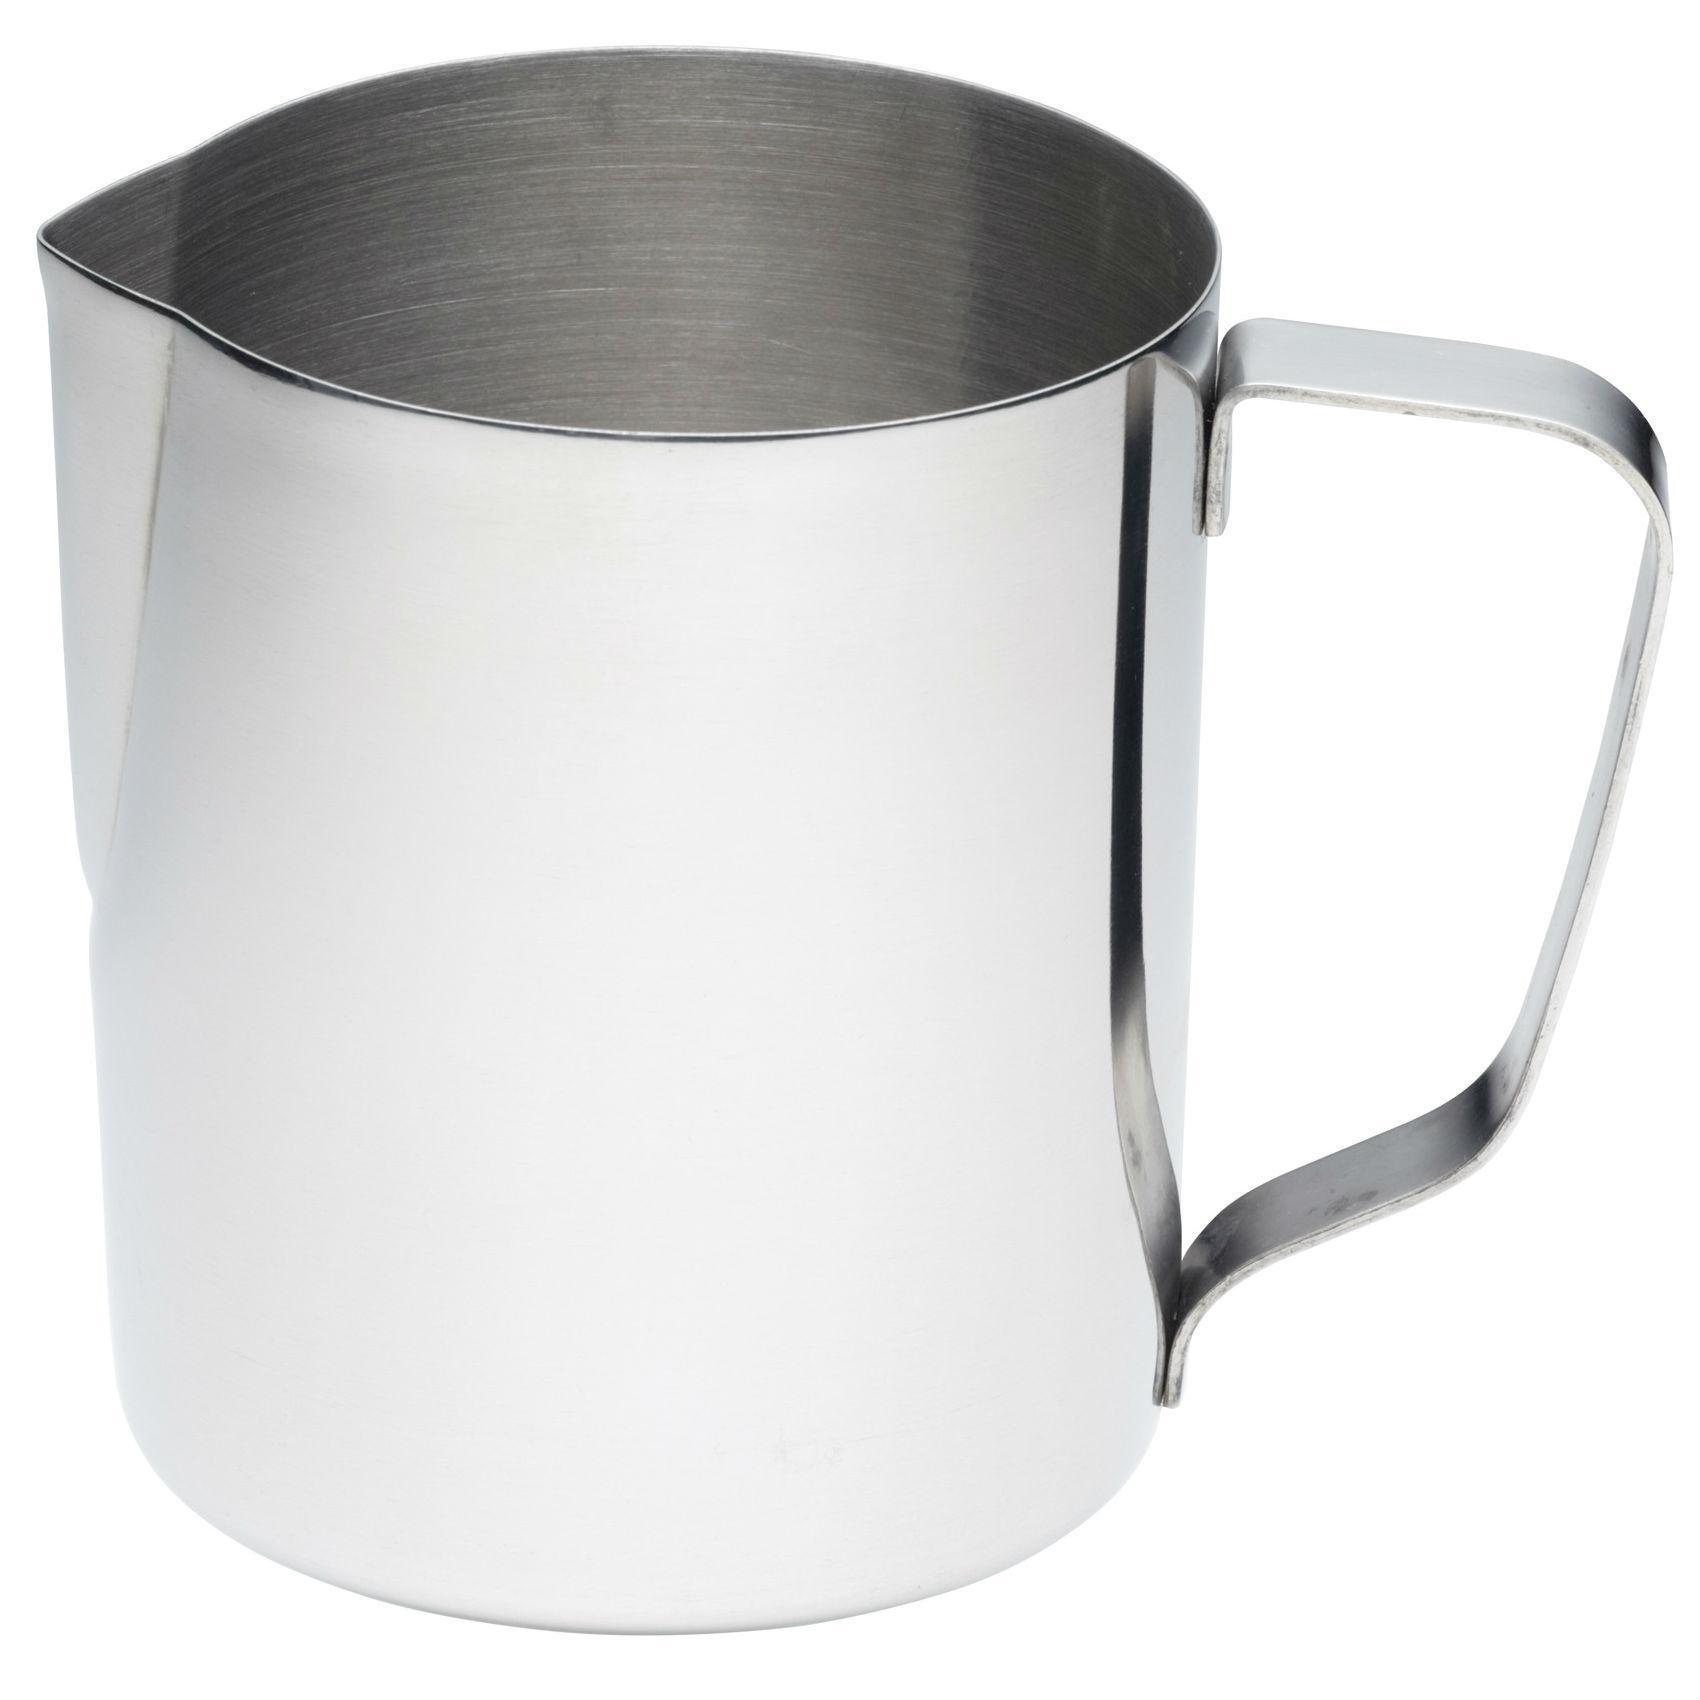 kitchencraft large stainless steel milk jug frothing jug. Black Bedroom Furniture Sets. Home Design Ideas